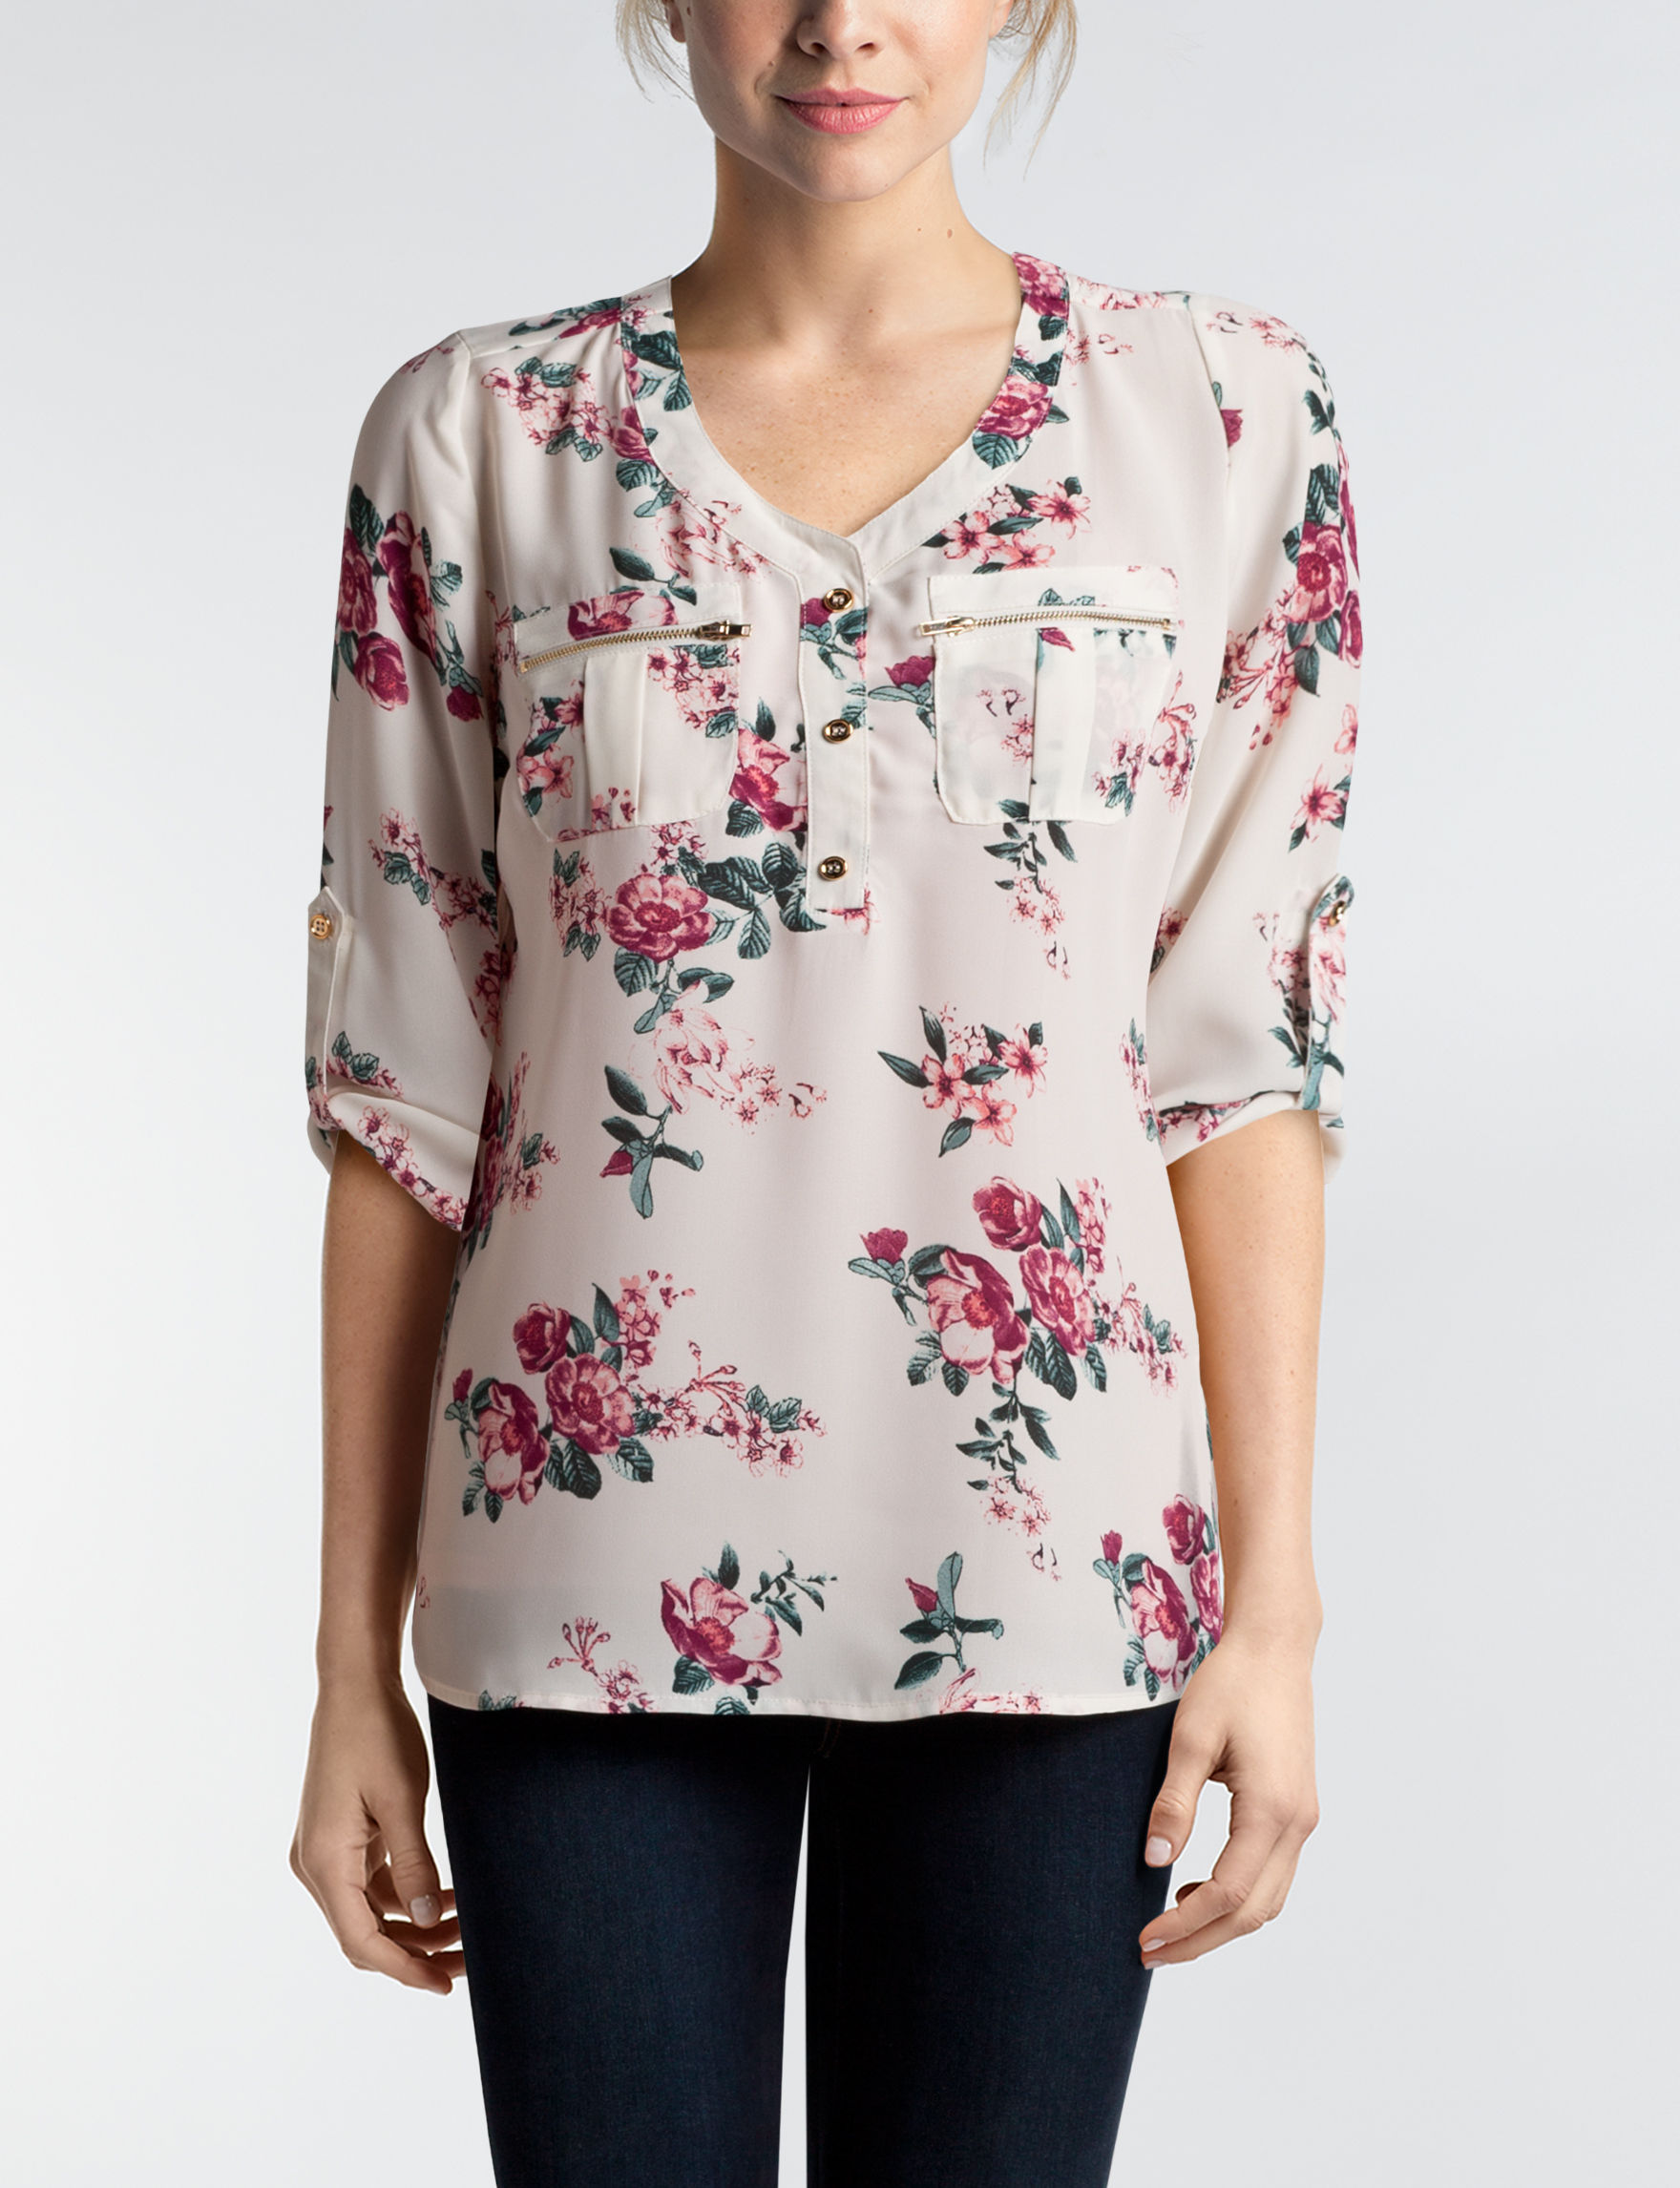 Wishful Park Ivory / Pink Shirts & Blouses